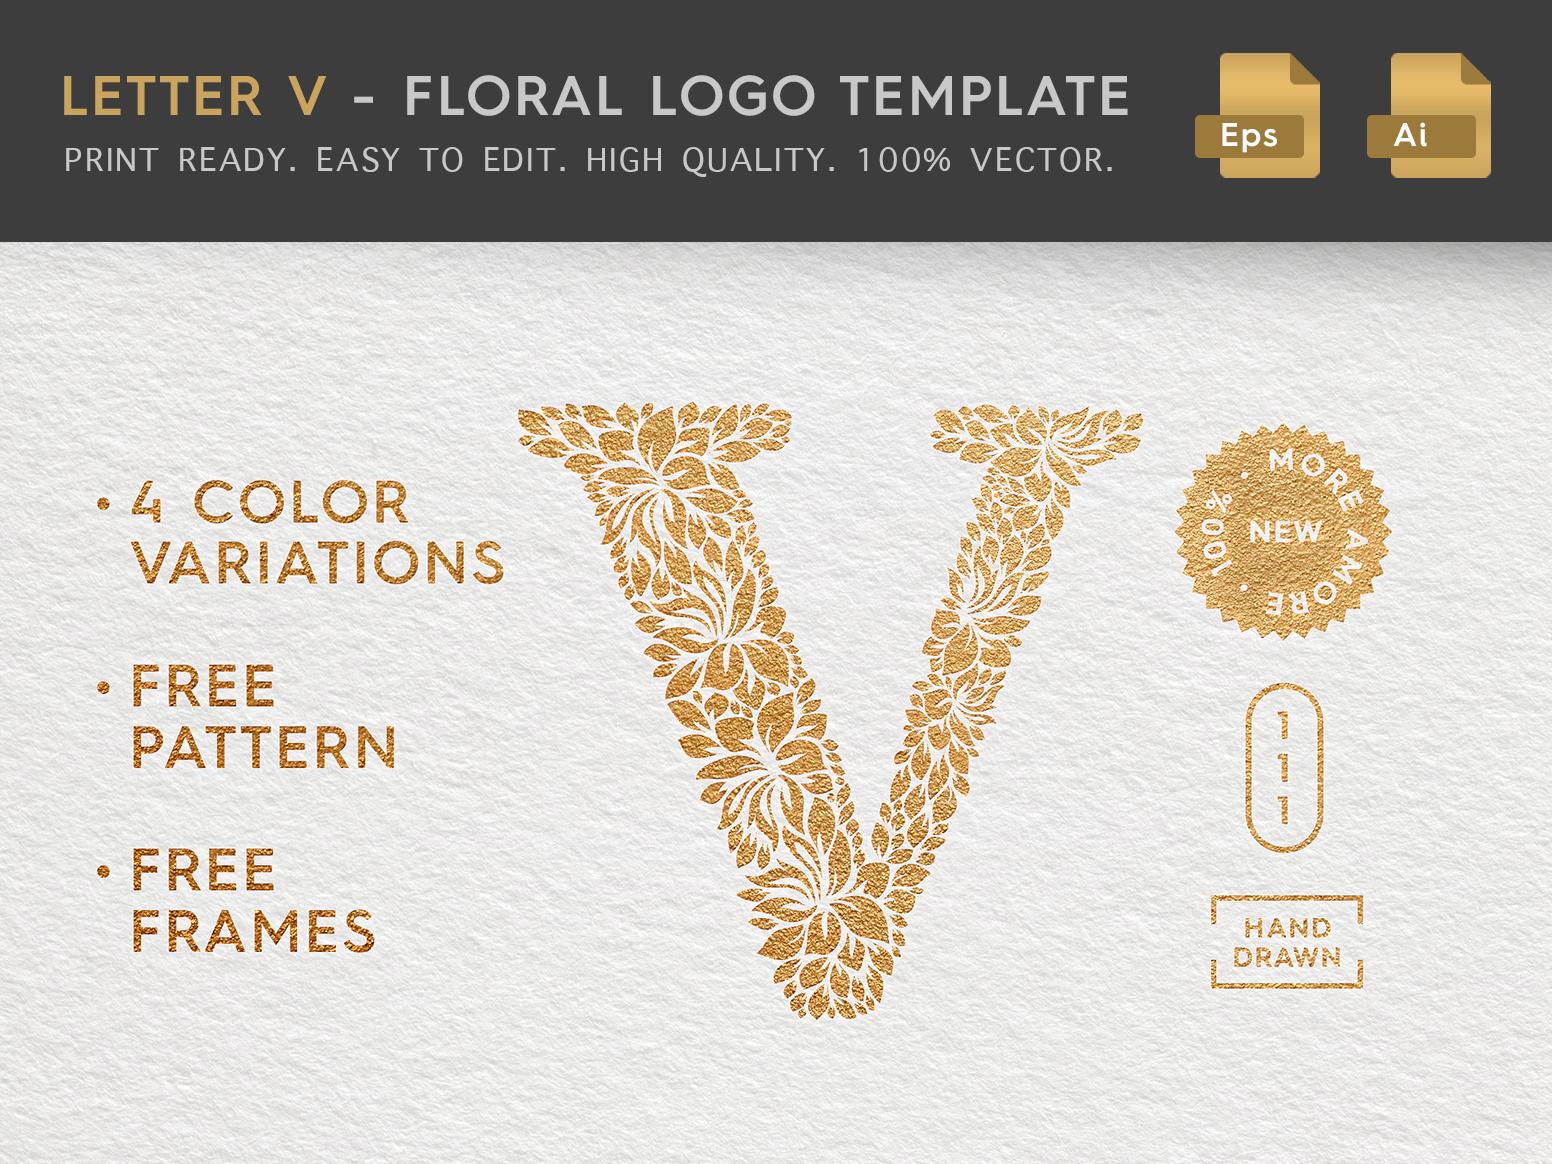 Floral Letter V Logo label beauty logo brand florist hand drawn logo eps logo vector logo delicate hand drawn illustration stationery sign logo template feminine logo female logo logo design floral logo letter logo letter x